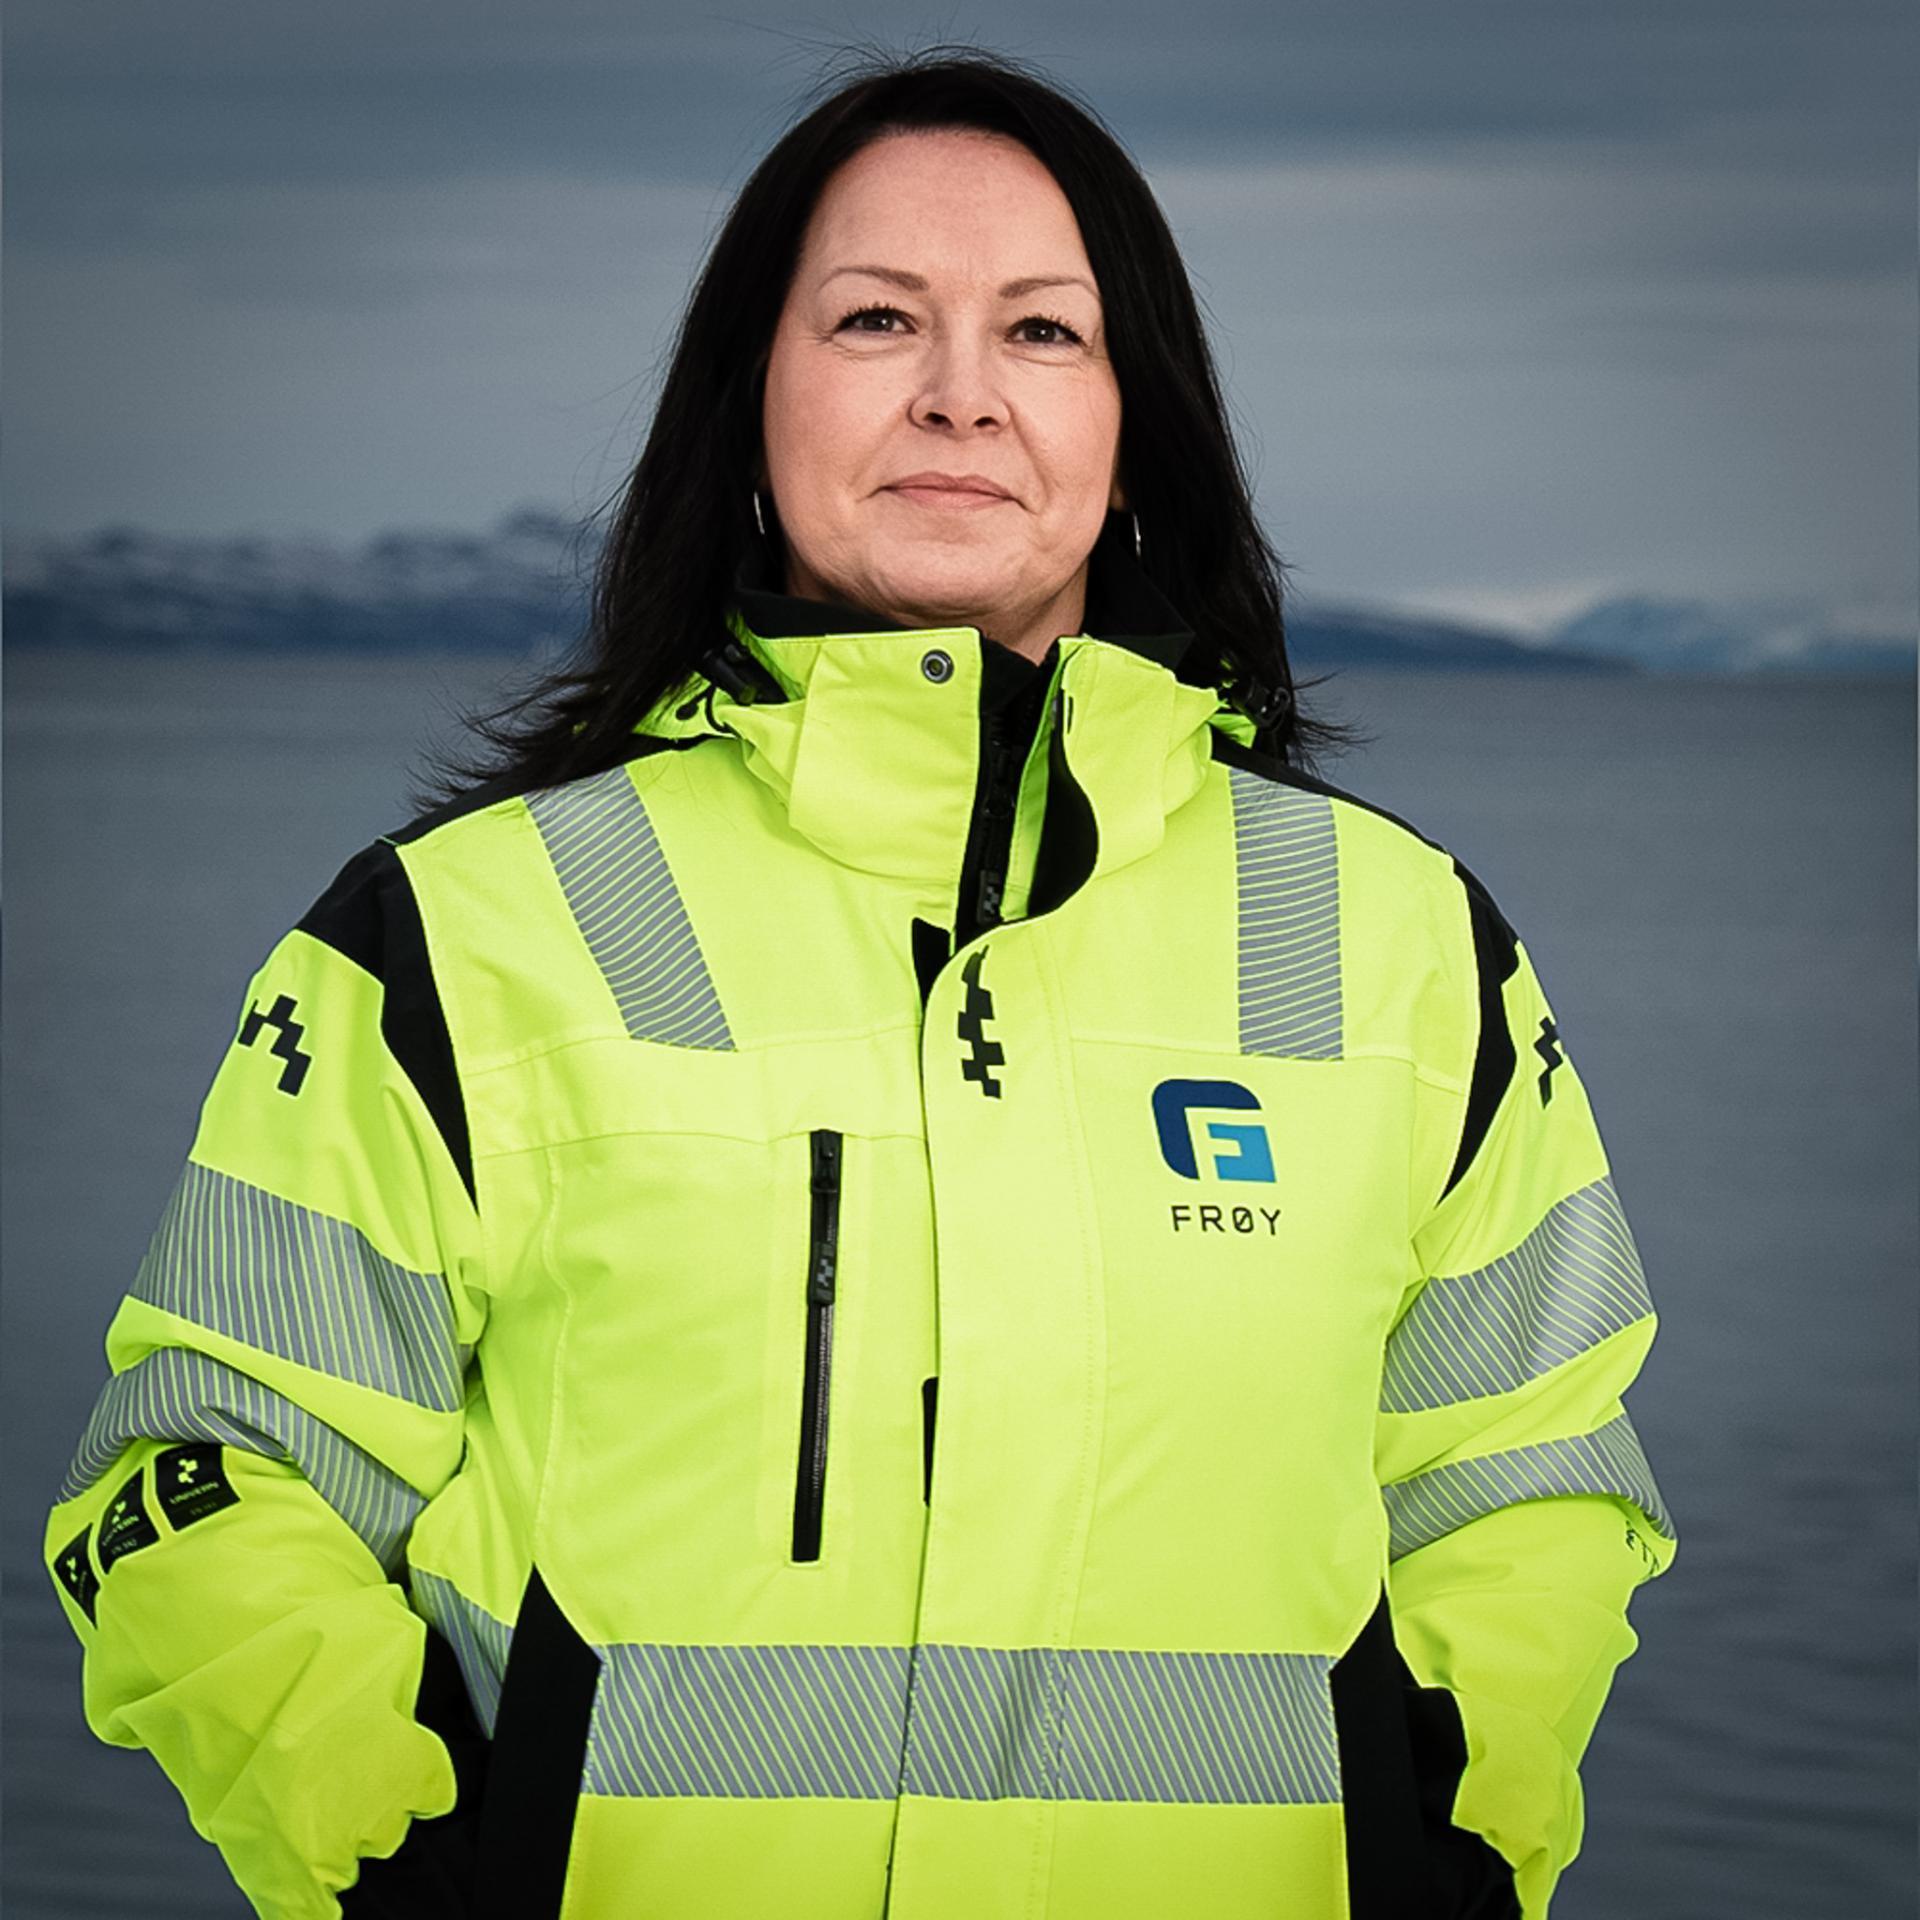 Unn Marit Holm